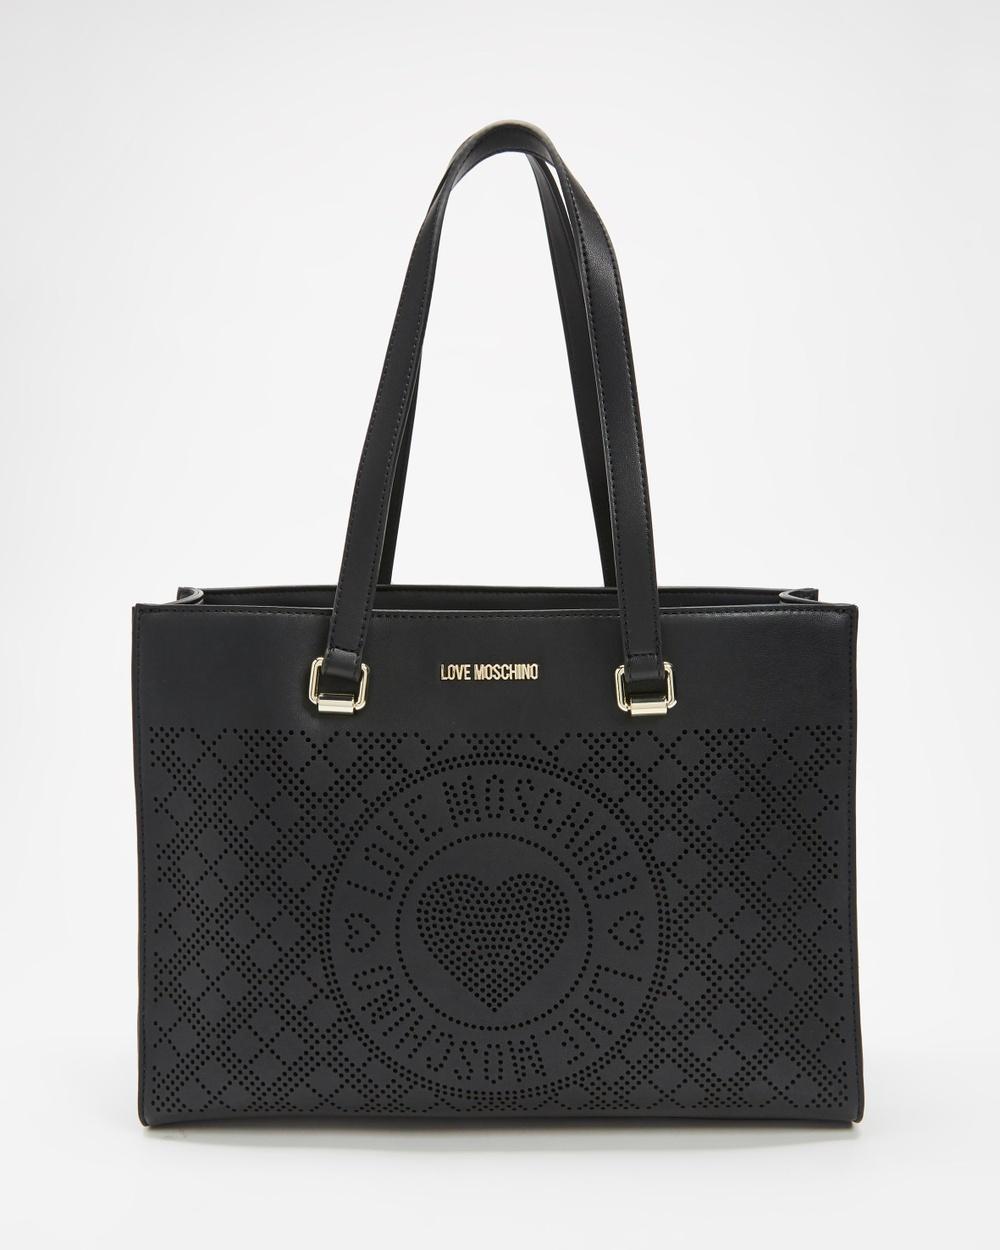 LOVE MOSCHINO PU Tote Bag Bags Nero & Grigio